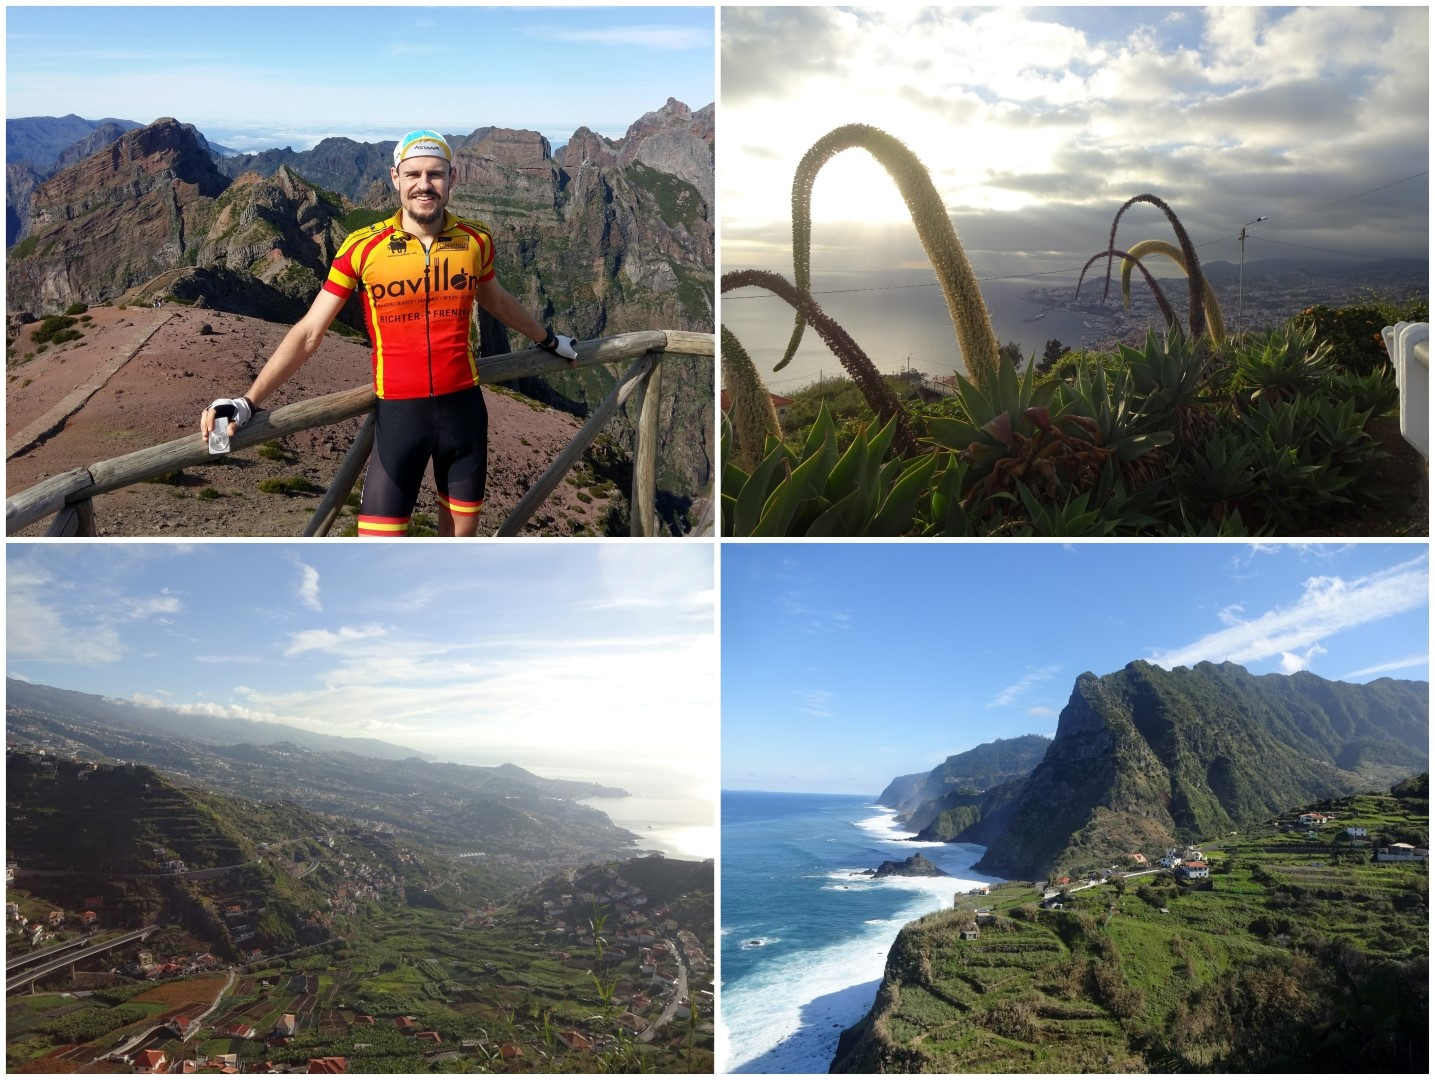 Trainingswoche auf Madeira